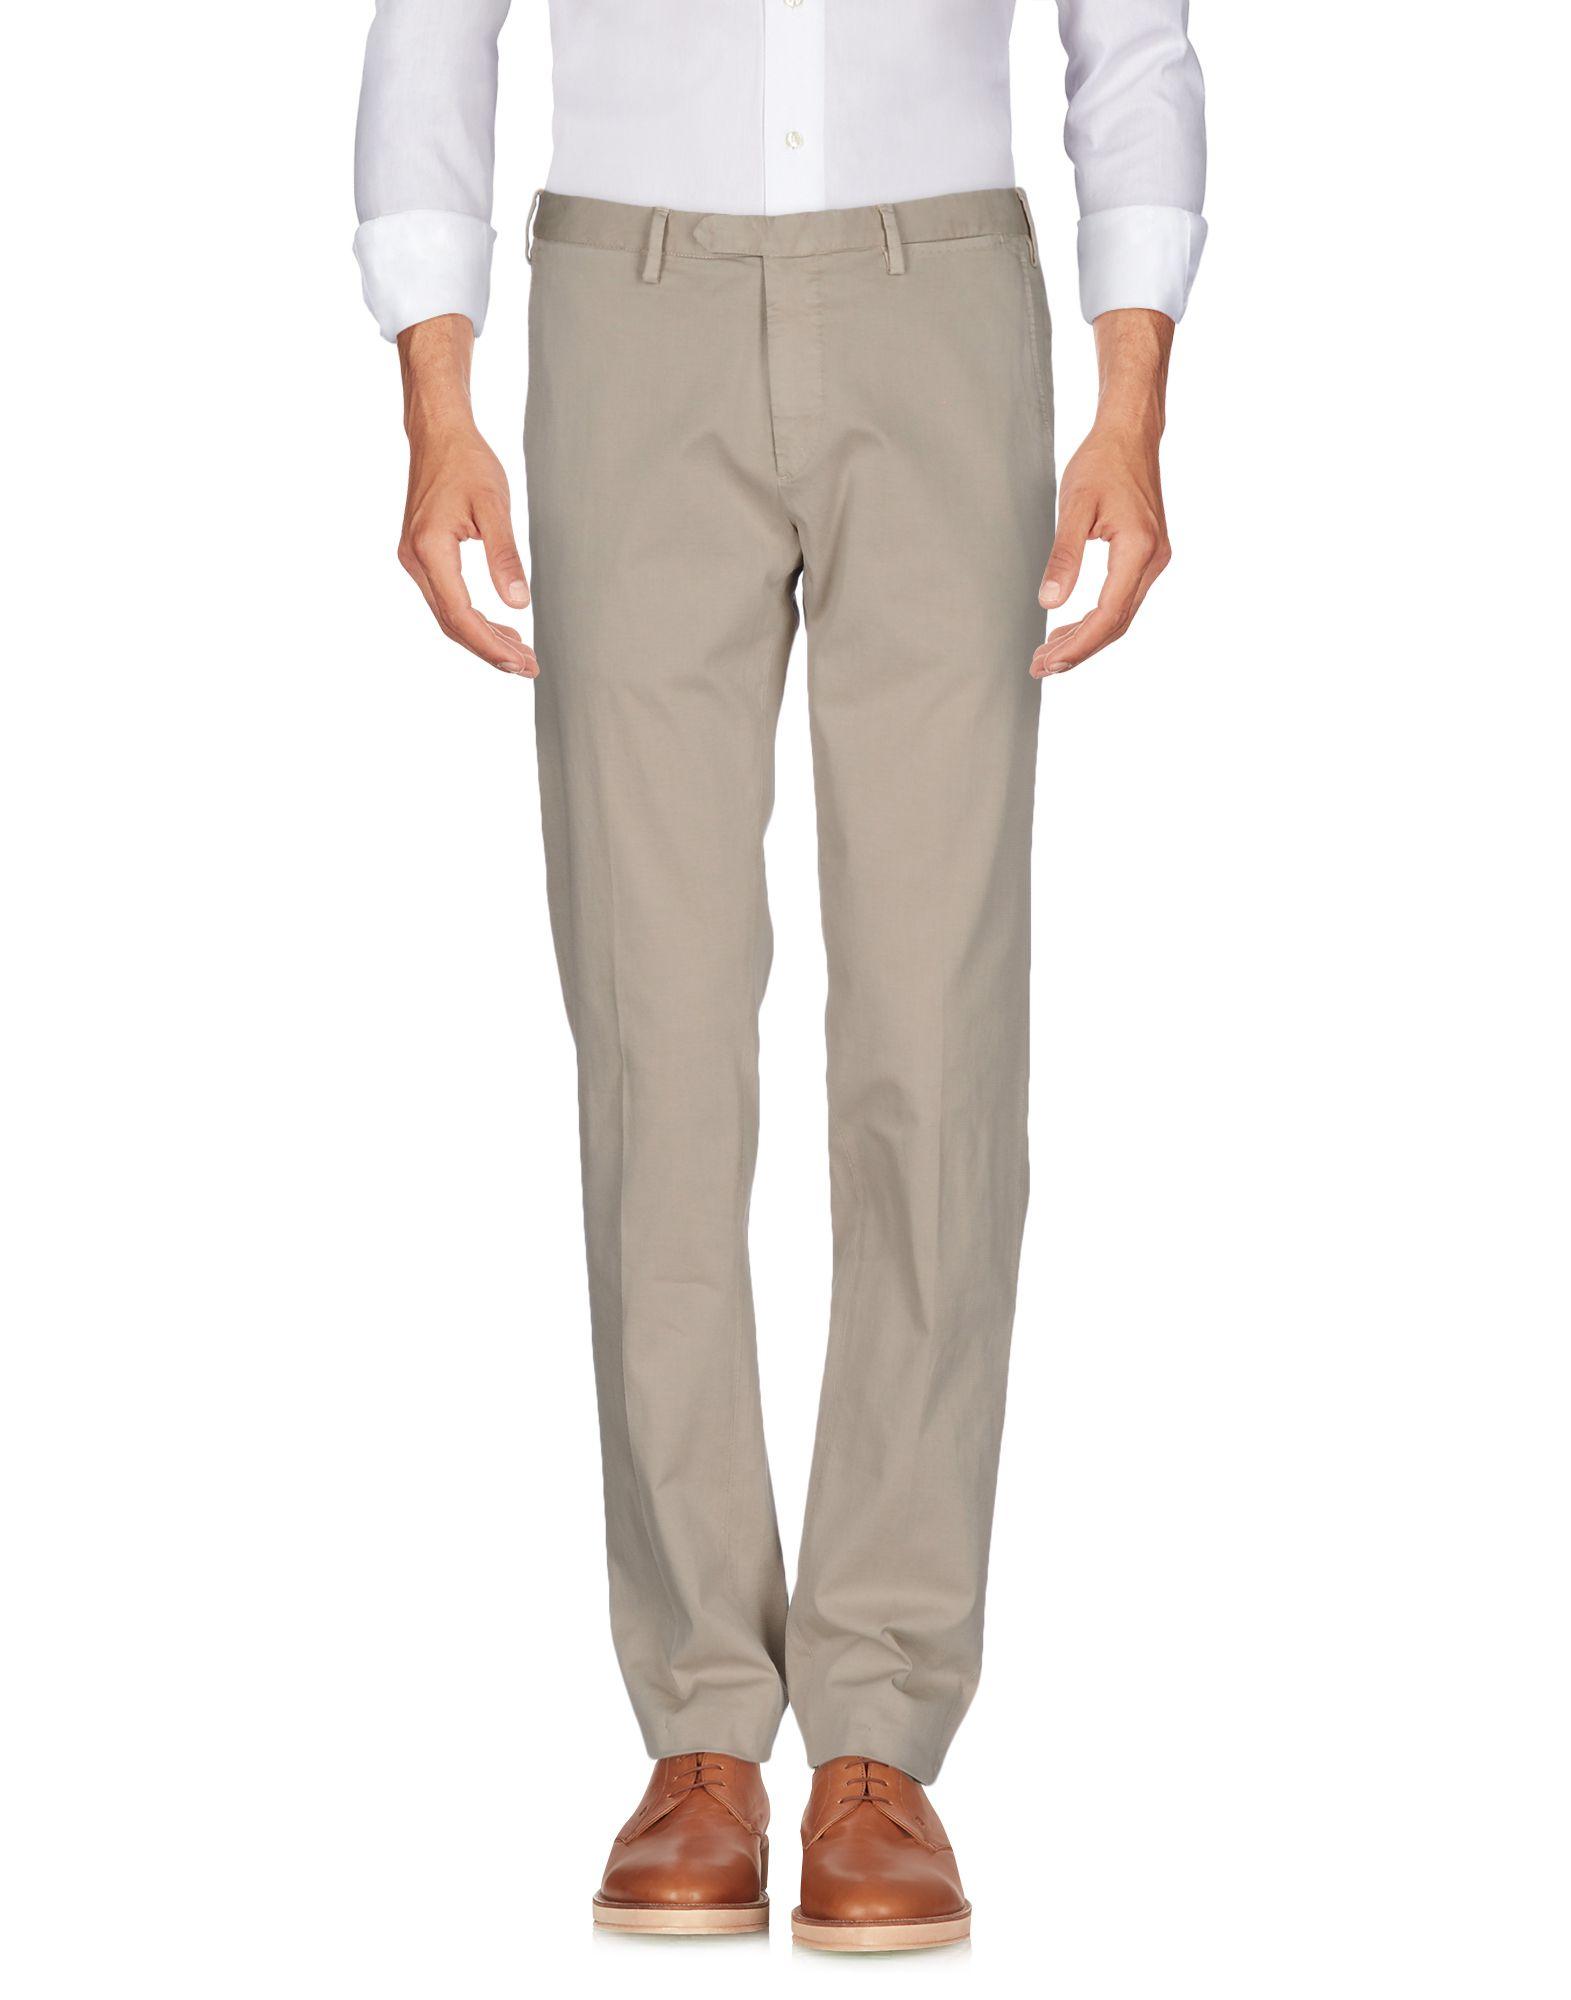 THREE POINTS Повседневные брюки повседневные брюки song promise cool points 1603 x 8 2015